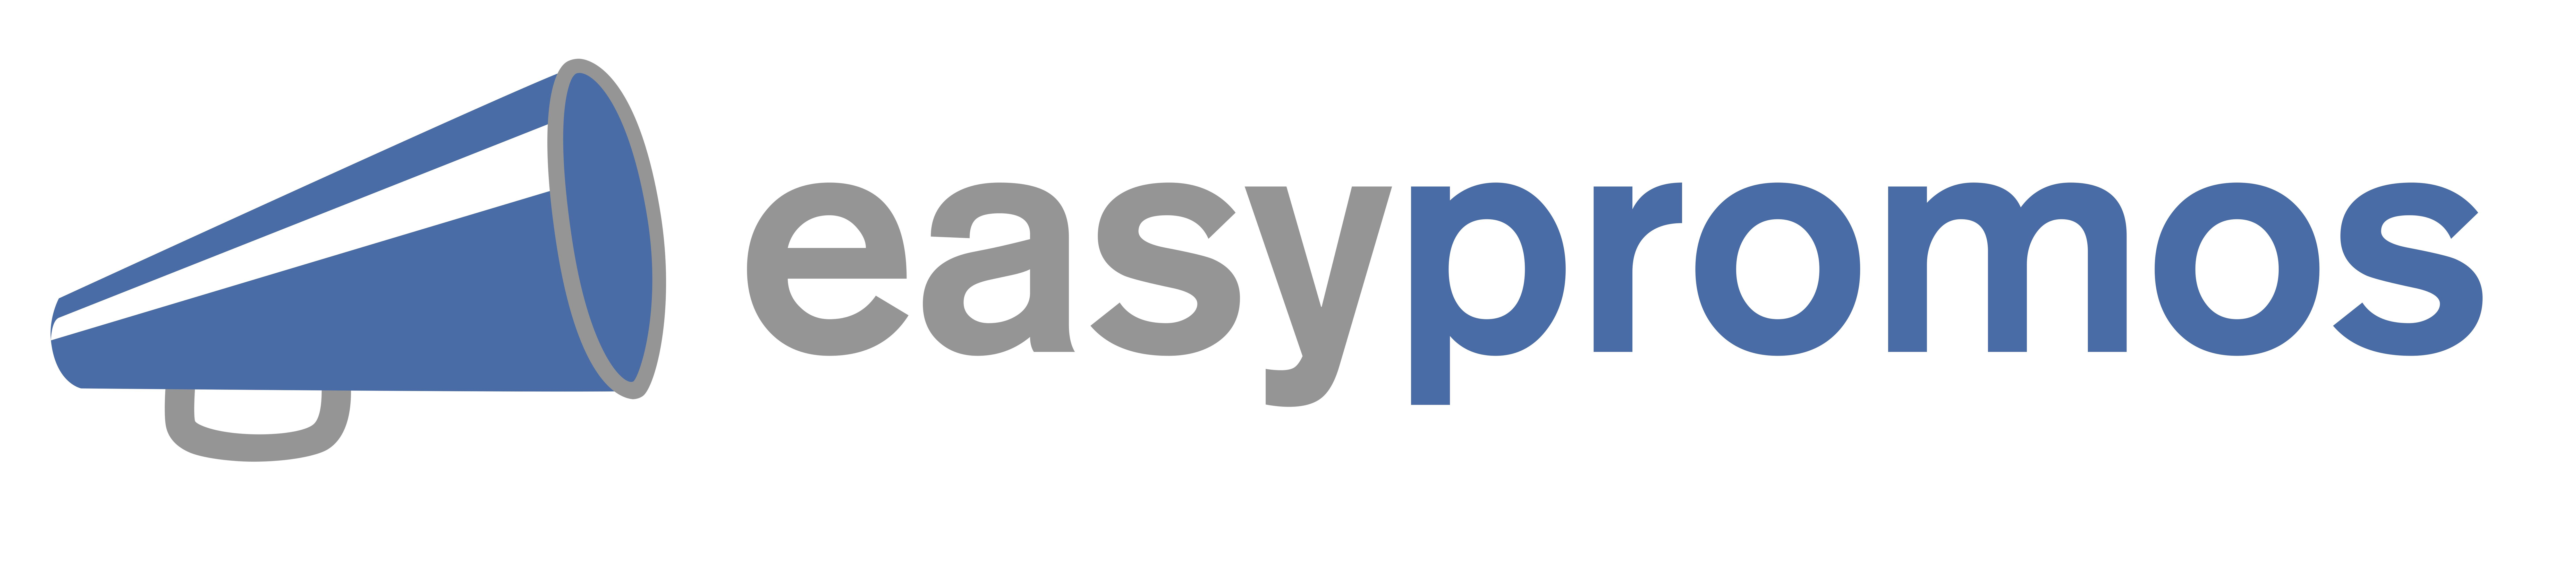 logo_easypromos